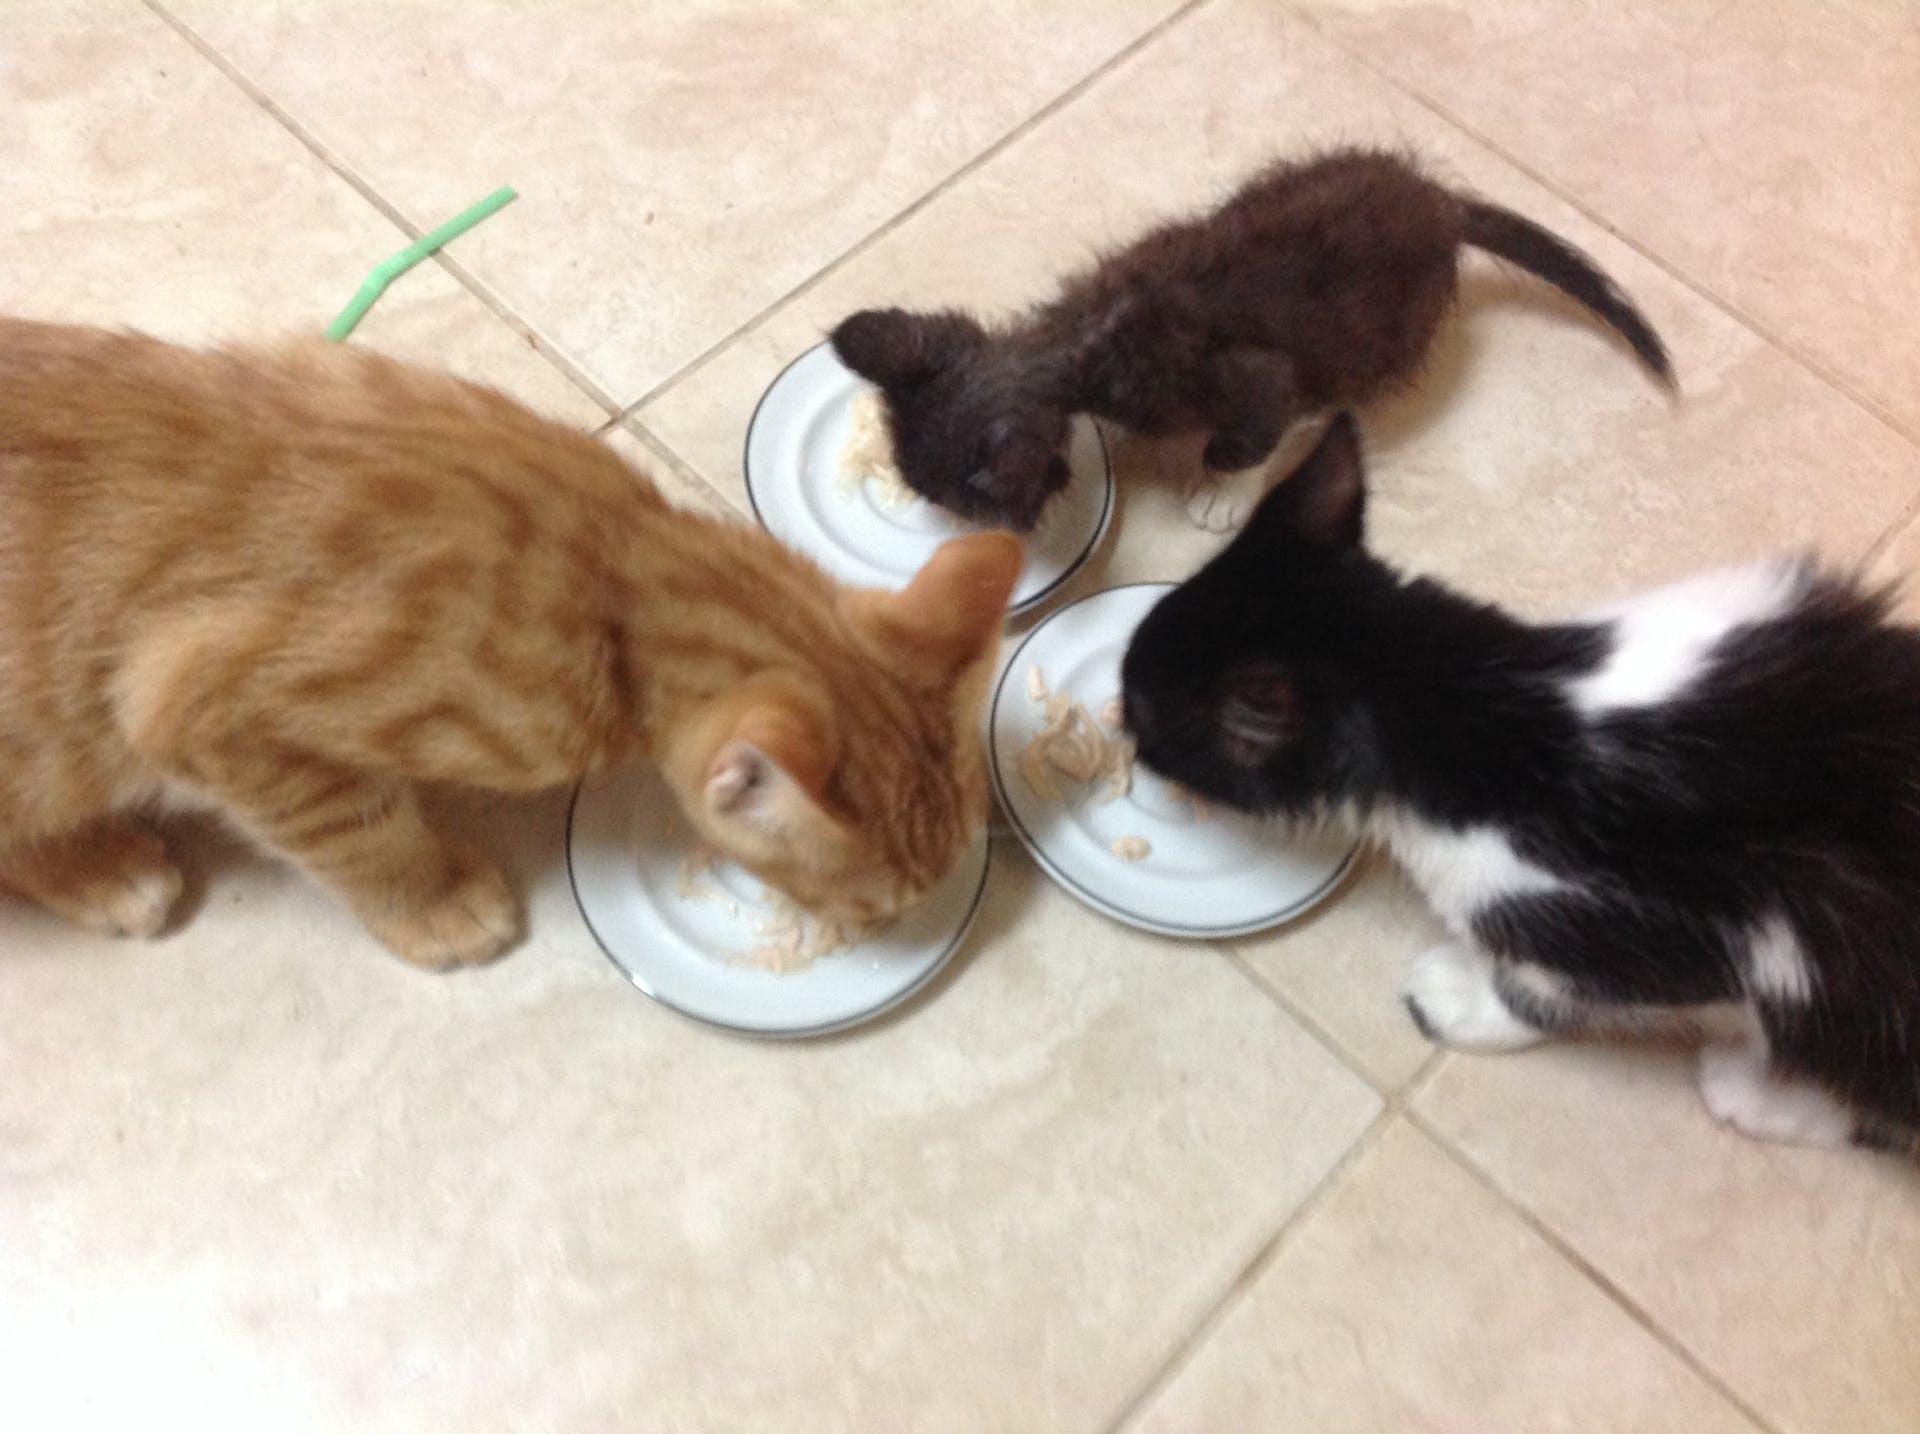 kitten kittens eating animal cats animal photography